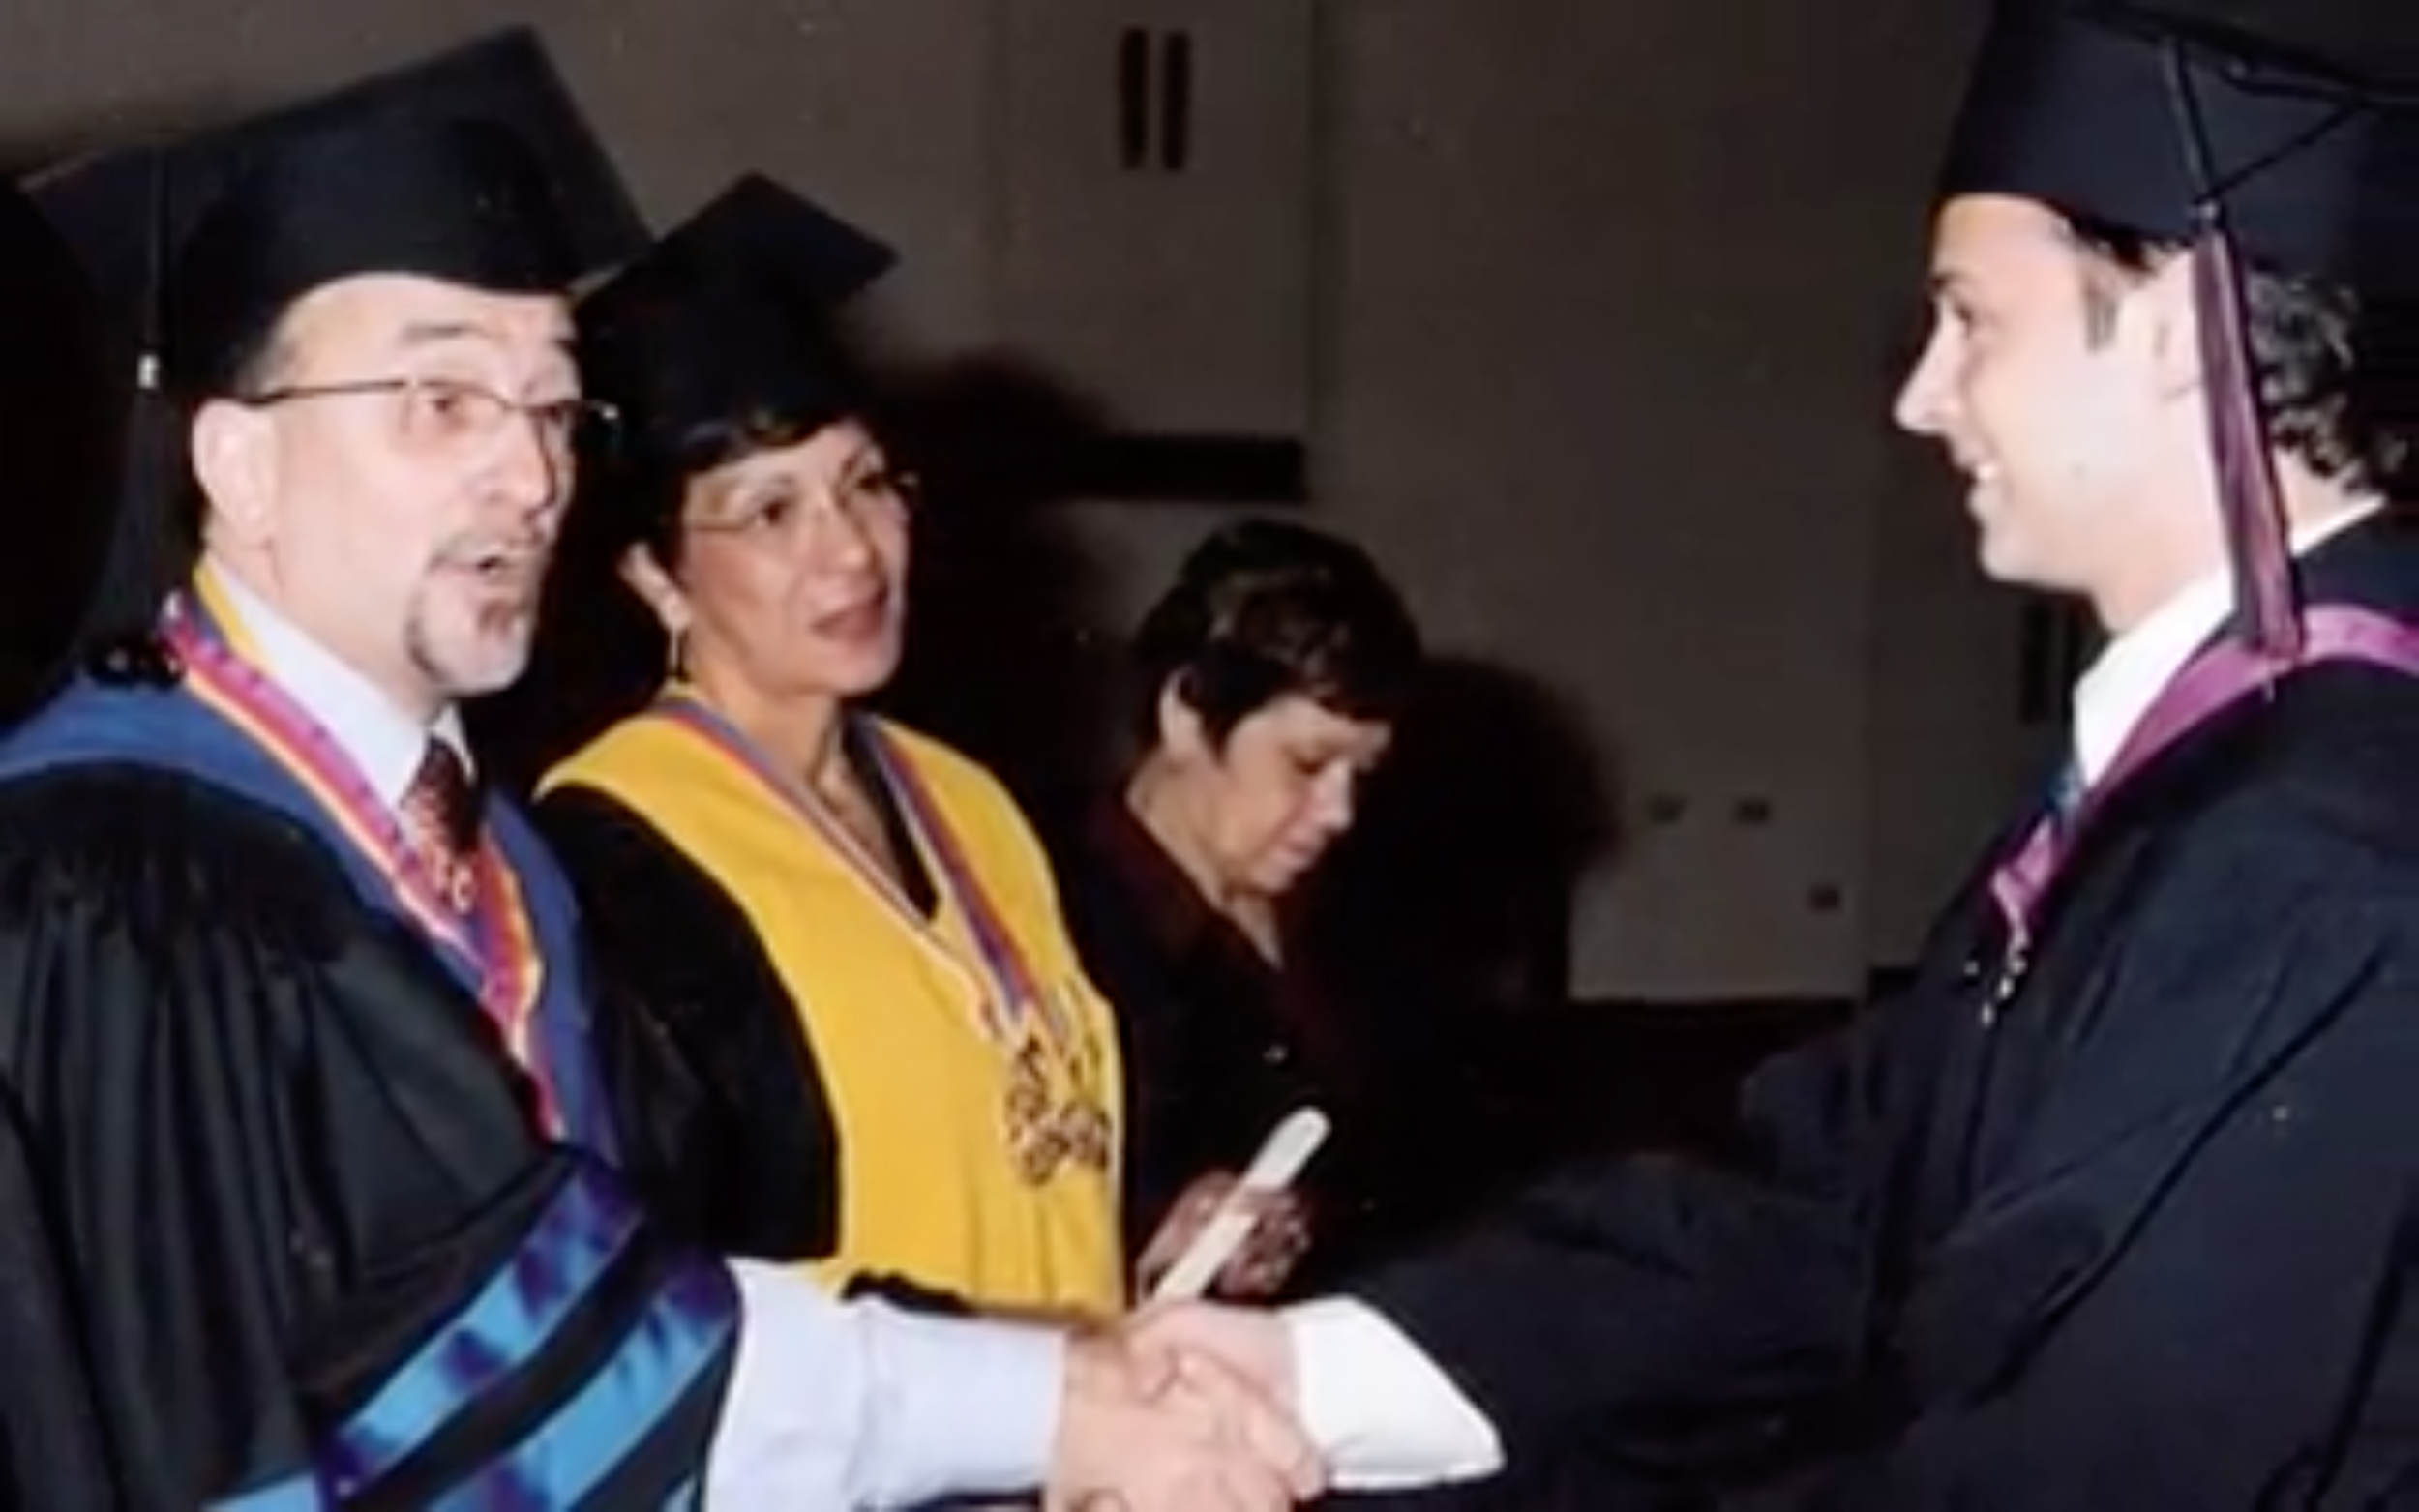 Graduation de Odontologo - 2003 - Venezuela